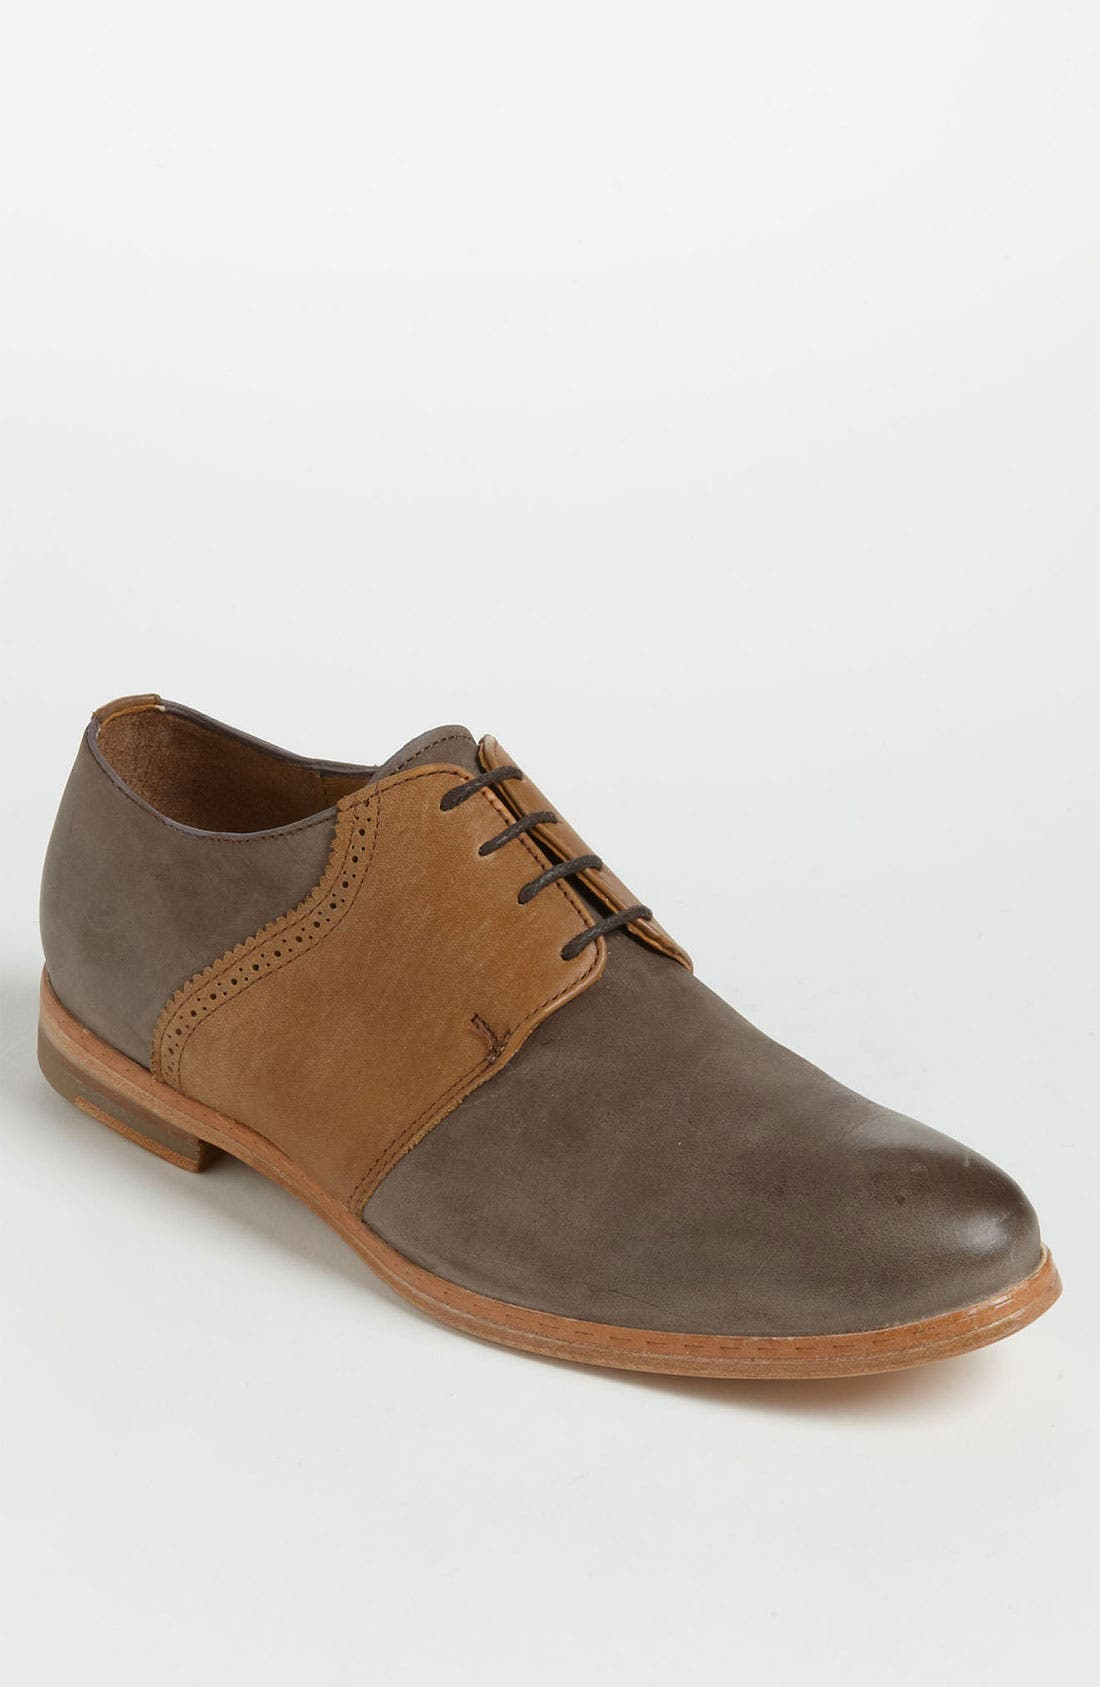 Main Image - J.D. Fisk 'Mosimo' Saddle Shoe